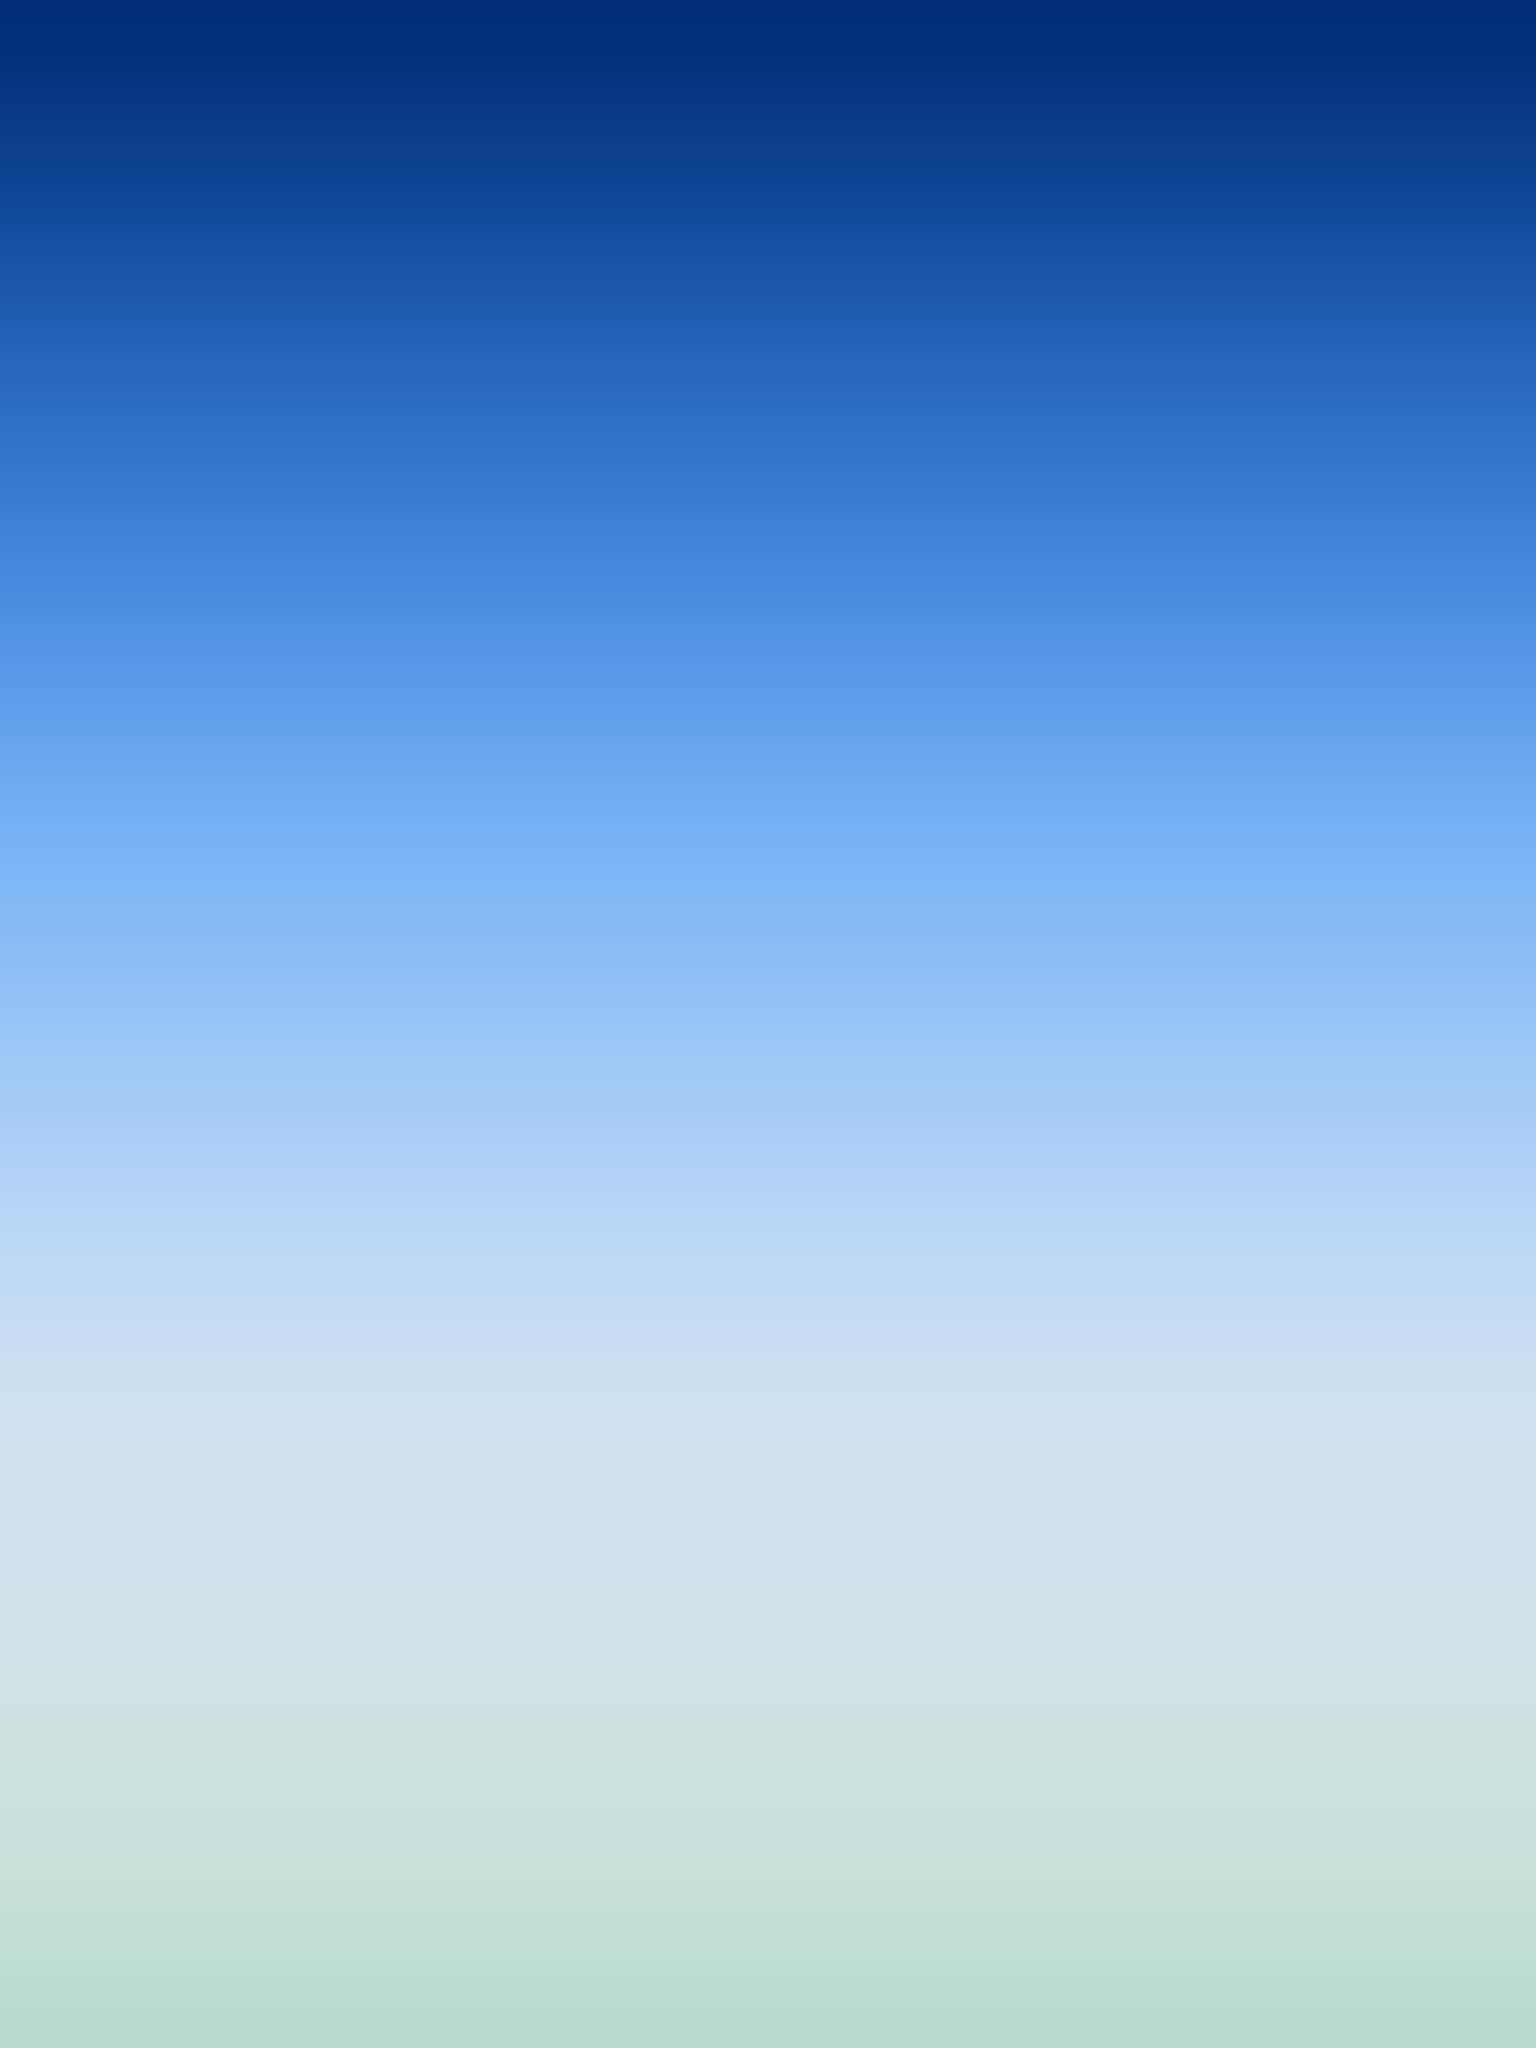 top 10 ipad air wallpaper